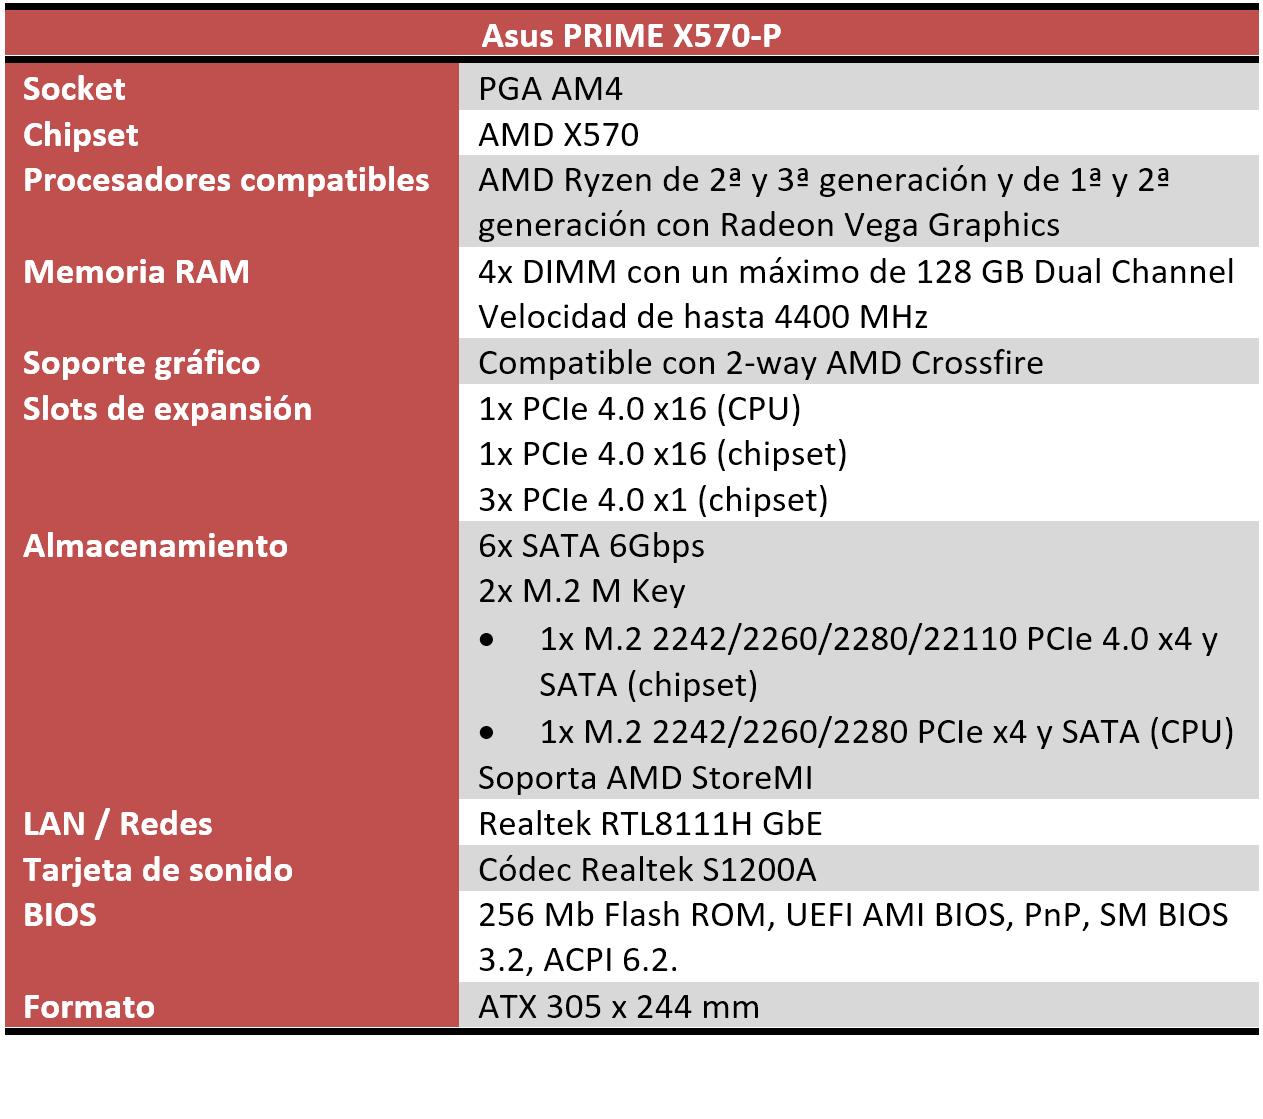 Asus PRIME X570-P características